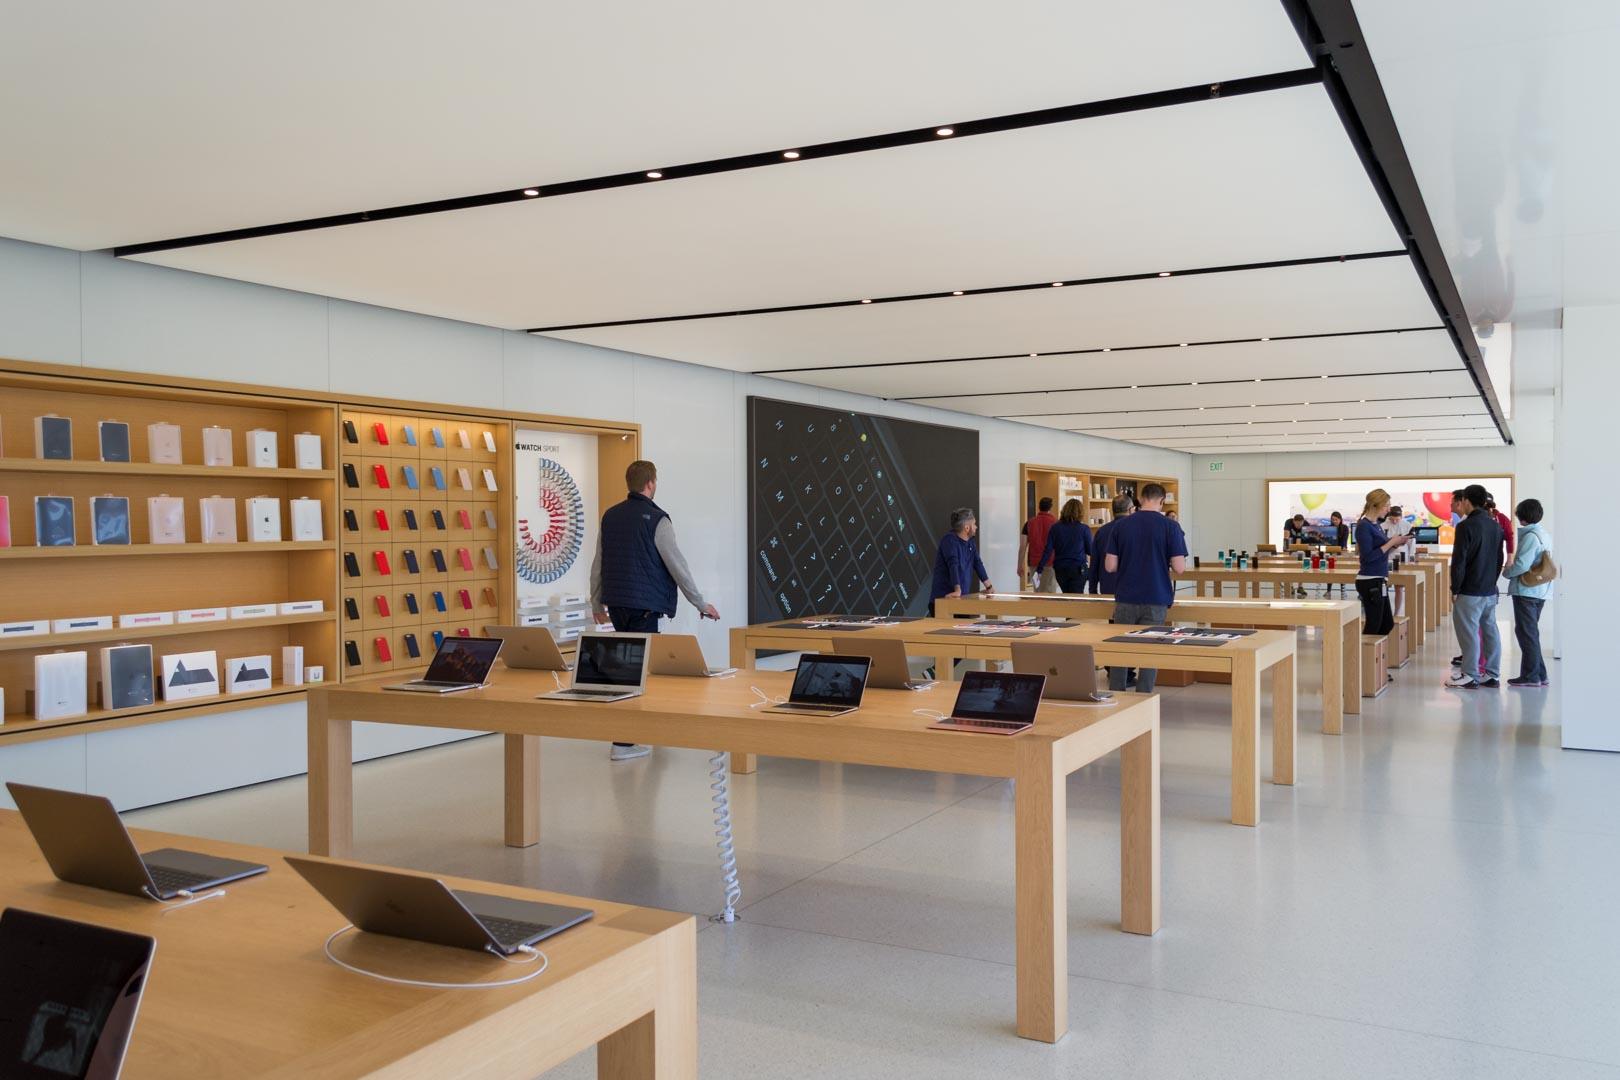 L'Apple Store d'Infinite Loop